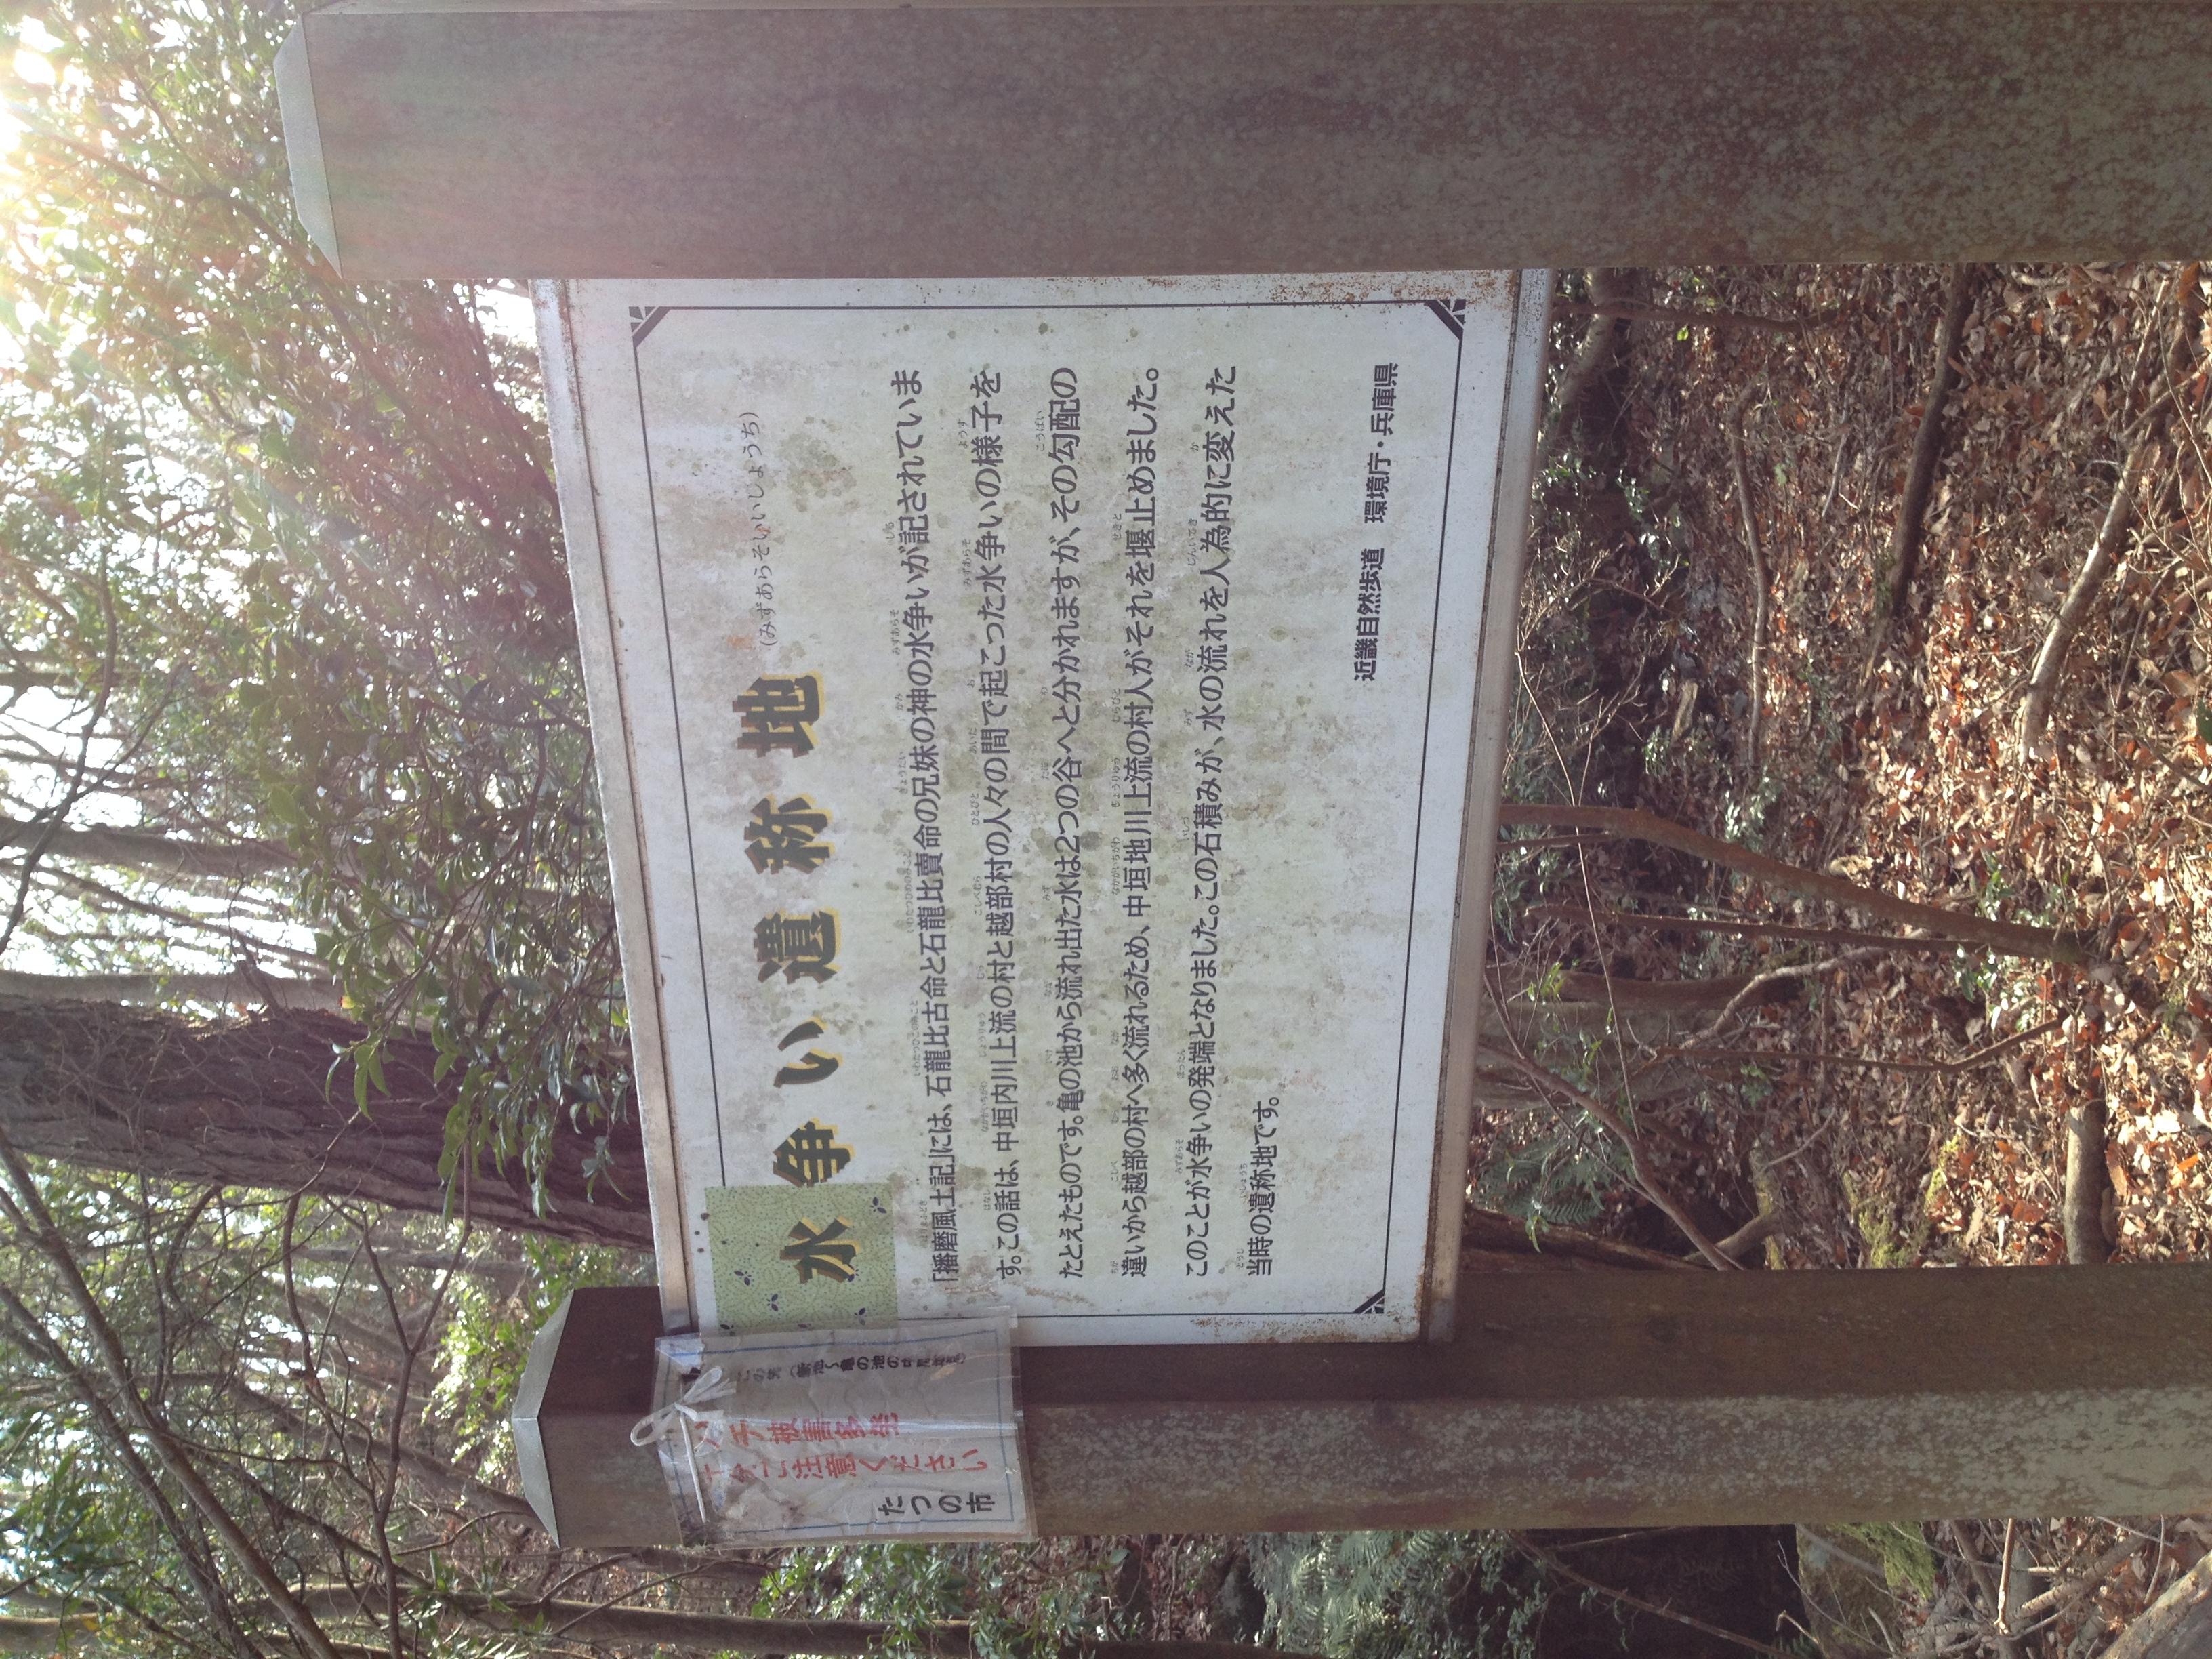 https://upload.wikimedia.org/wikipedia/commons/d/d6/Iseki_okumiya05.JPG